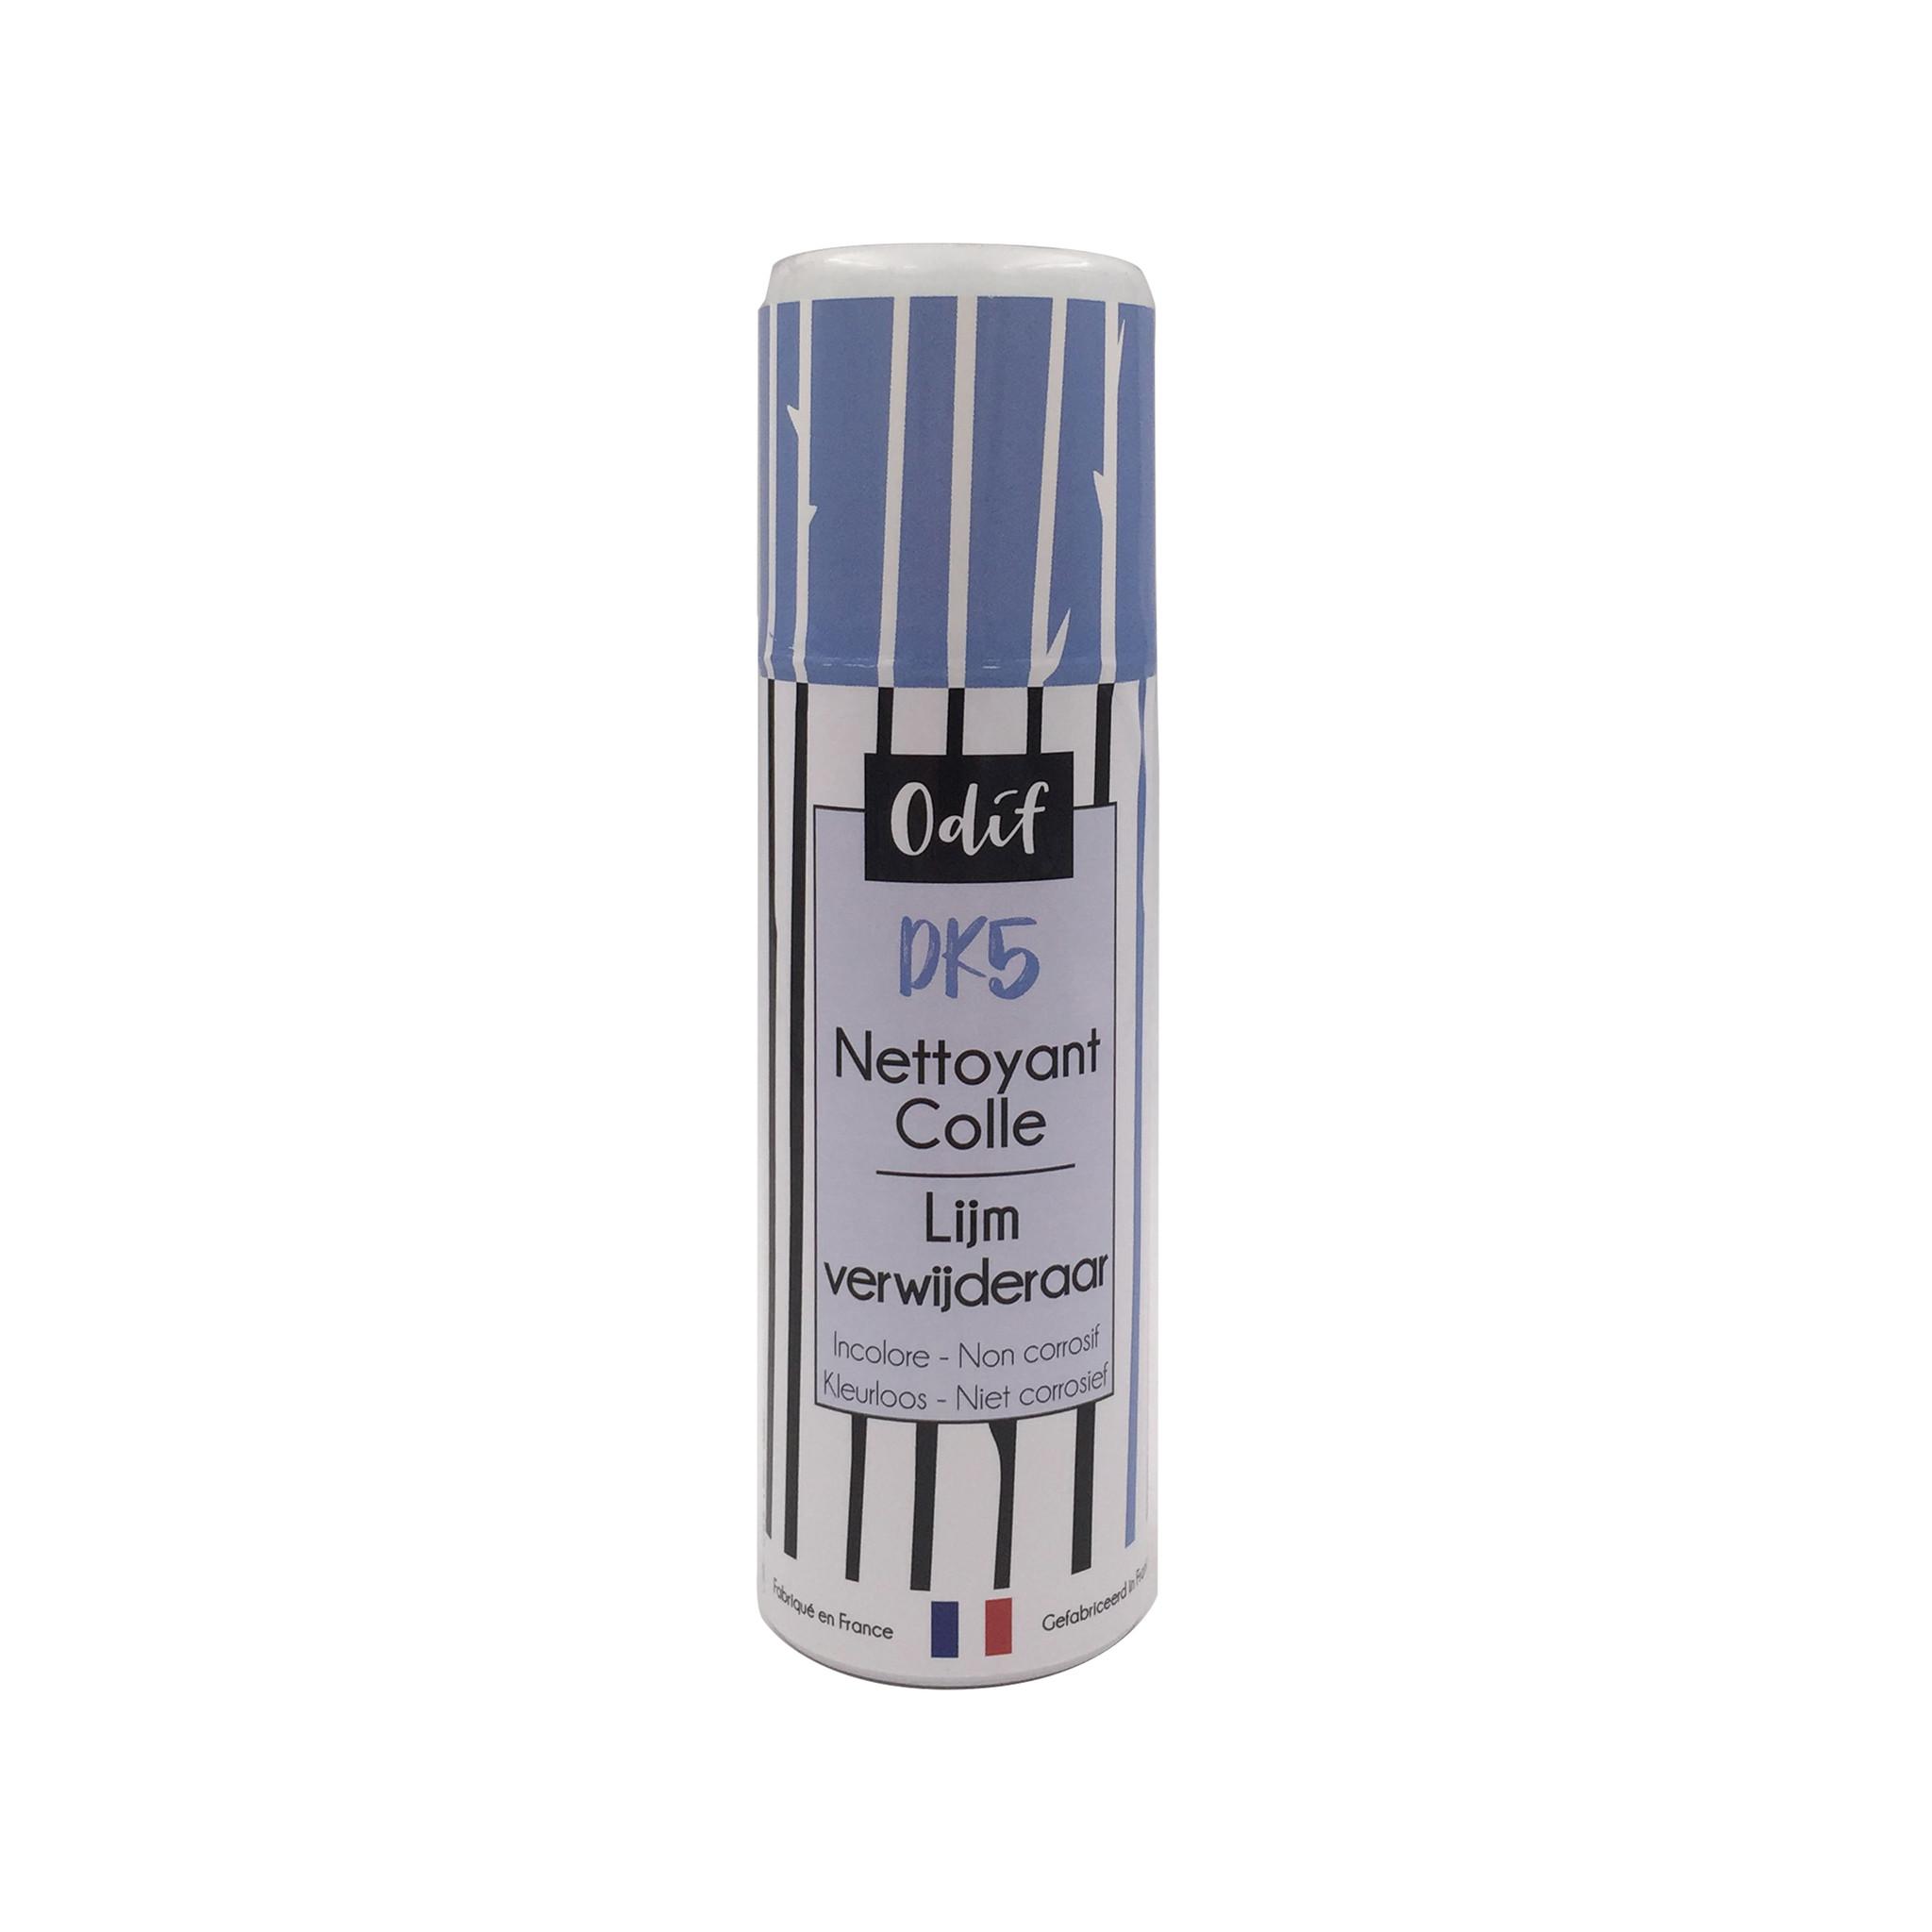 Odif - DK5 Glue Remover (125ml)